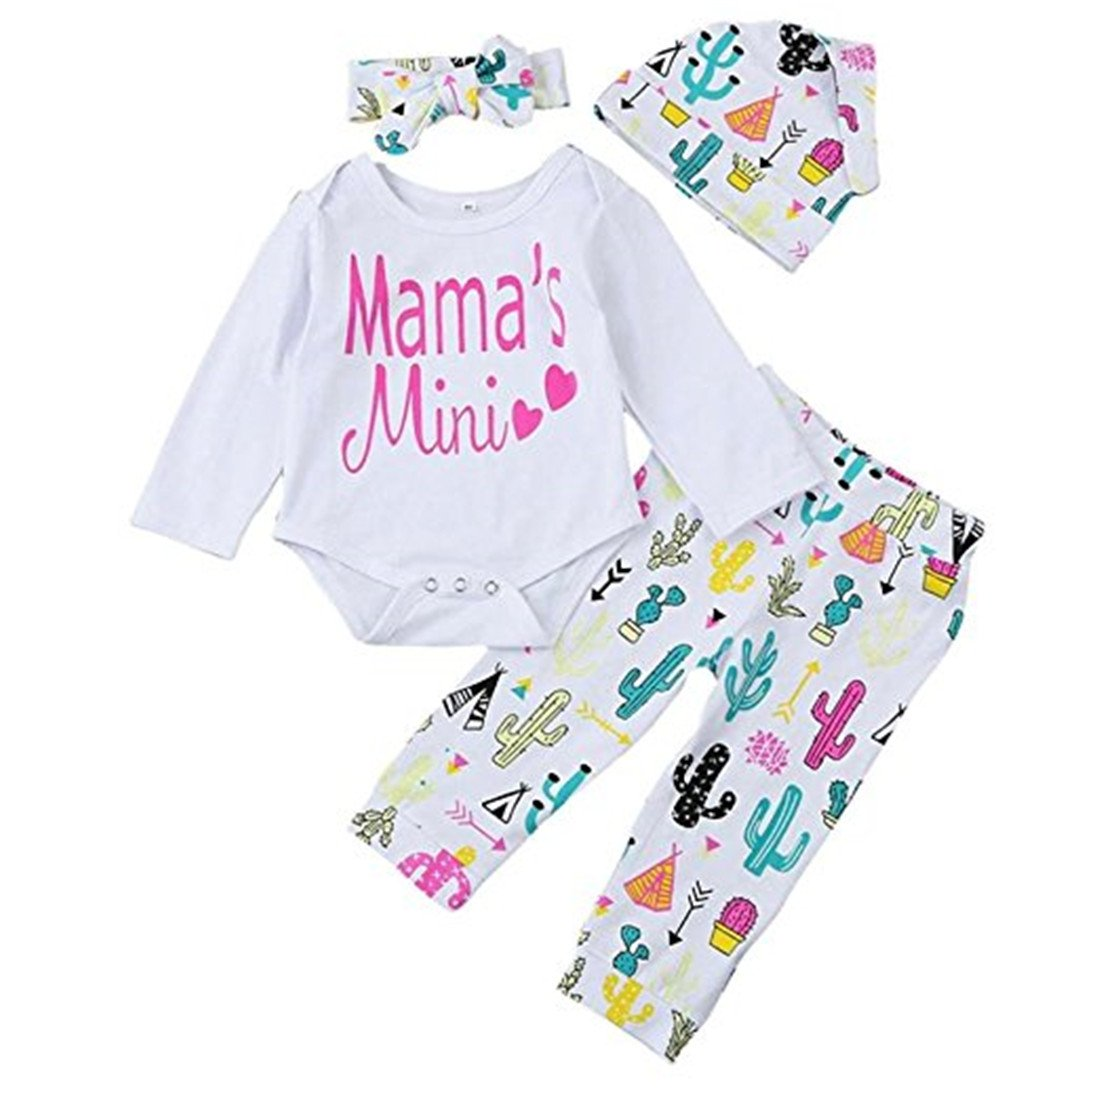 c1c42ac41467 Amazon.com  REWANGOING 4PCS Baby Toddler Girls Cactus Print Long Sleeve  Romper+Flower Pant+Hat+Headband Outfits  Clothing